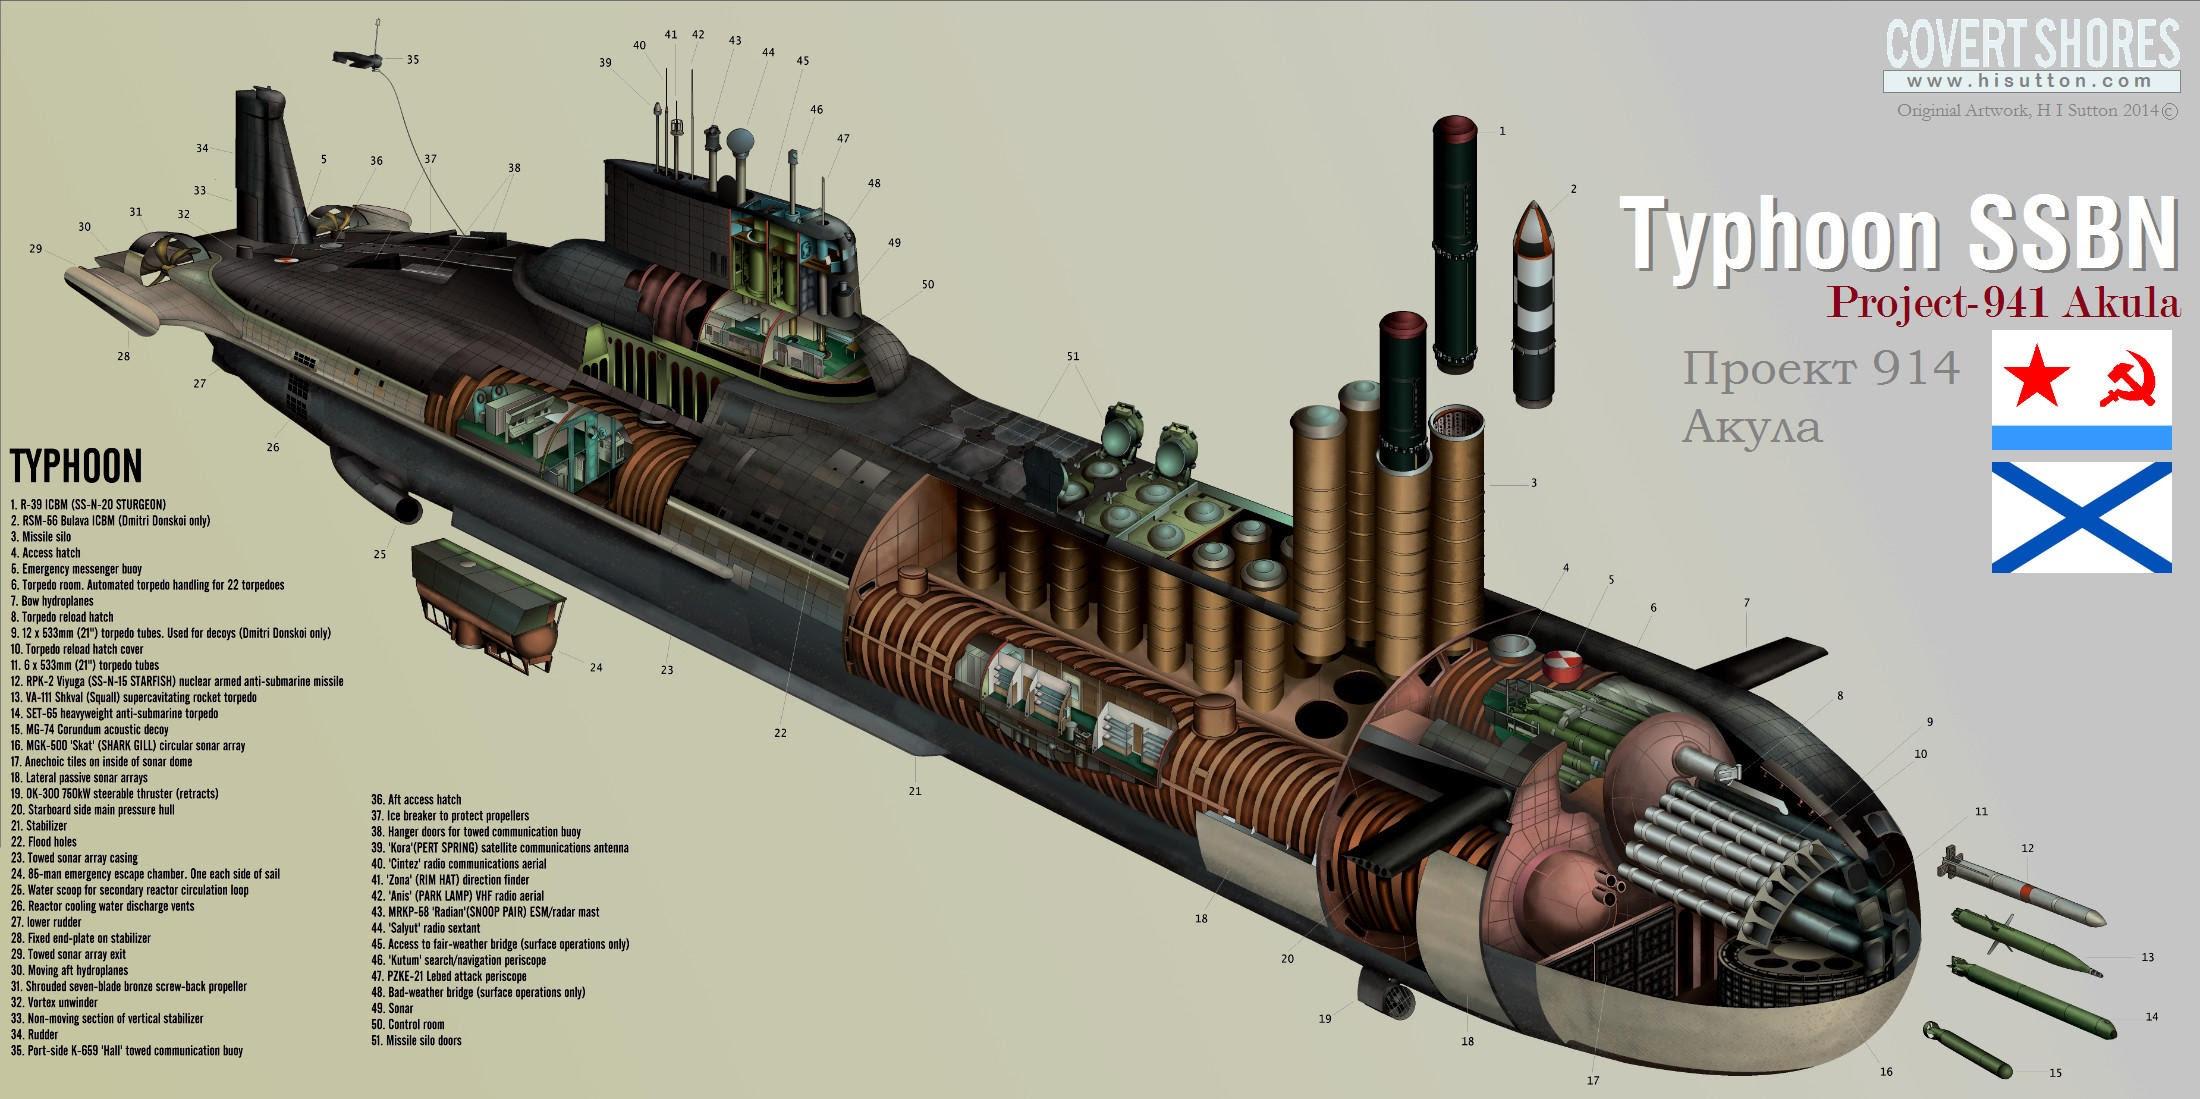 Submarino nuclear do Projeto 941 da Classe Akula